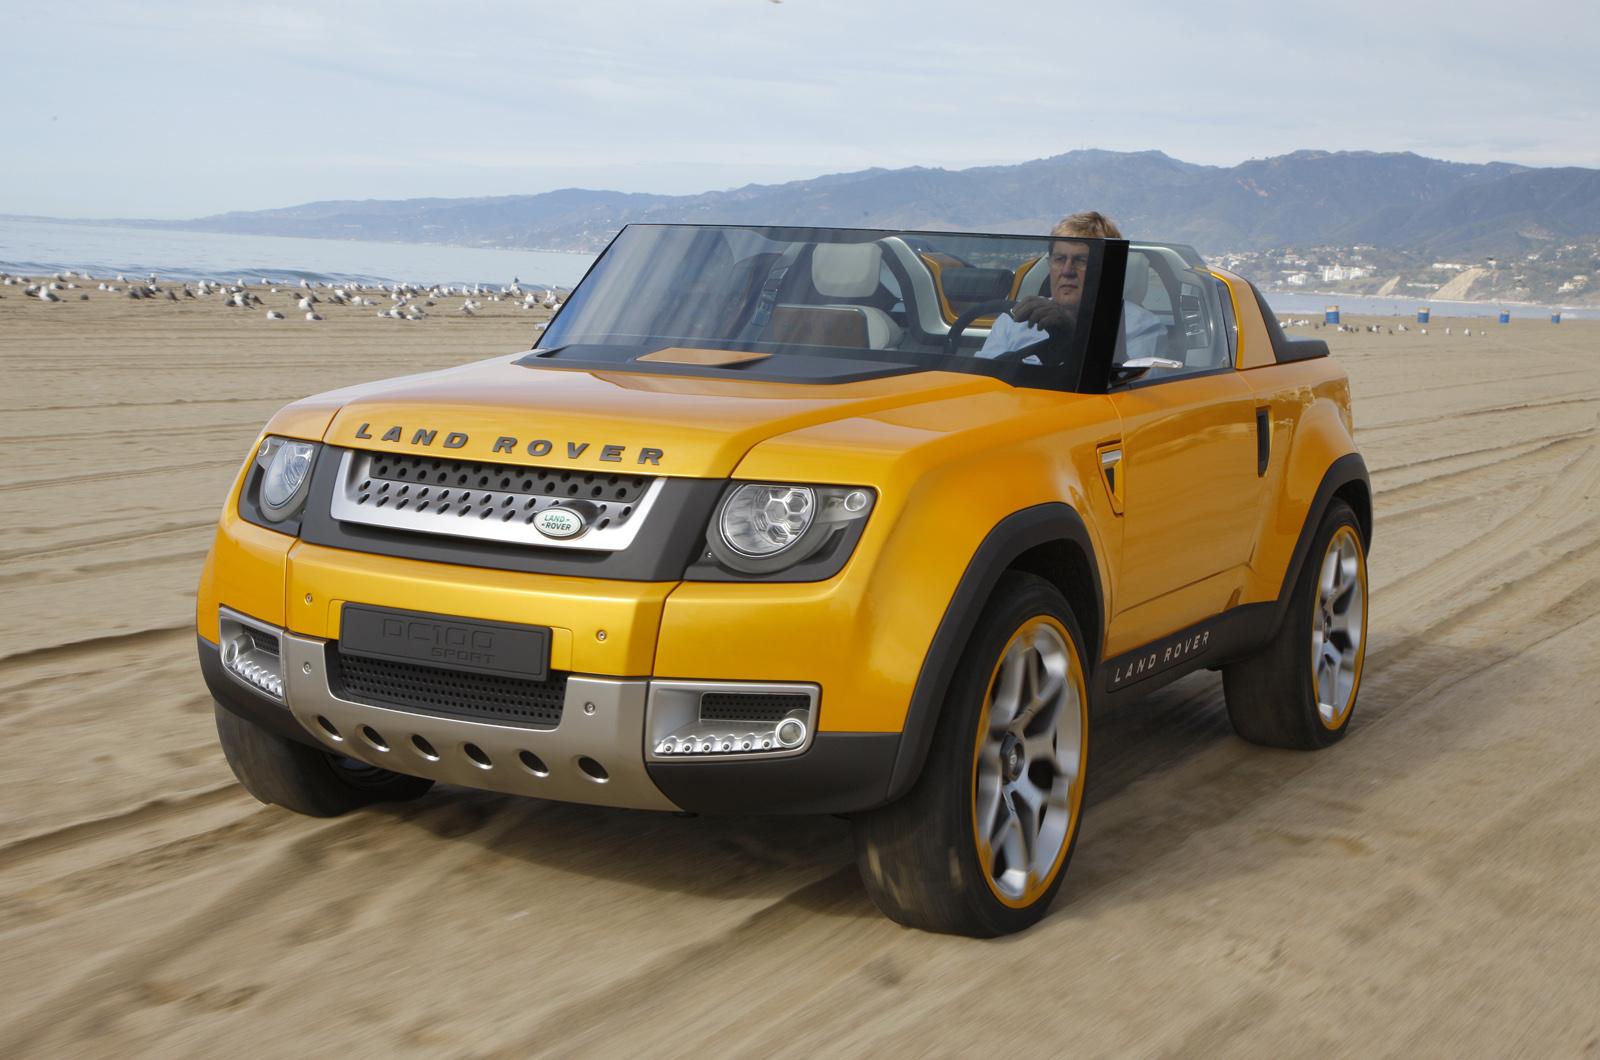 16 new land rovers revealed autocar. Black Bedroom Furniture Sets. Home Design Ideas